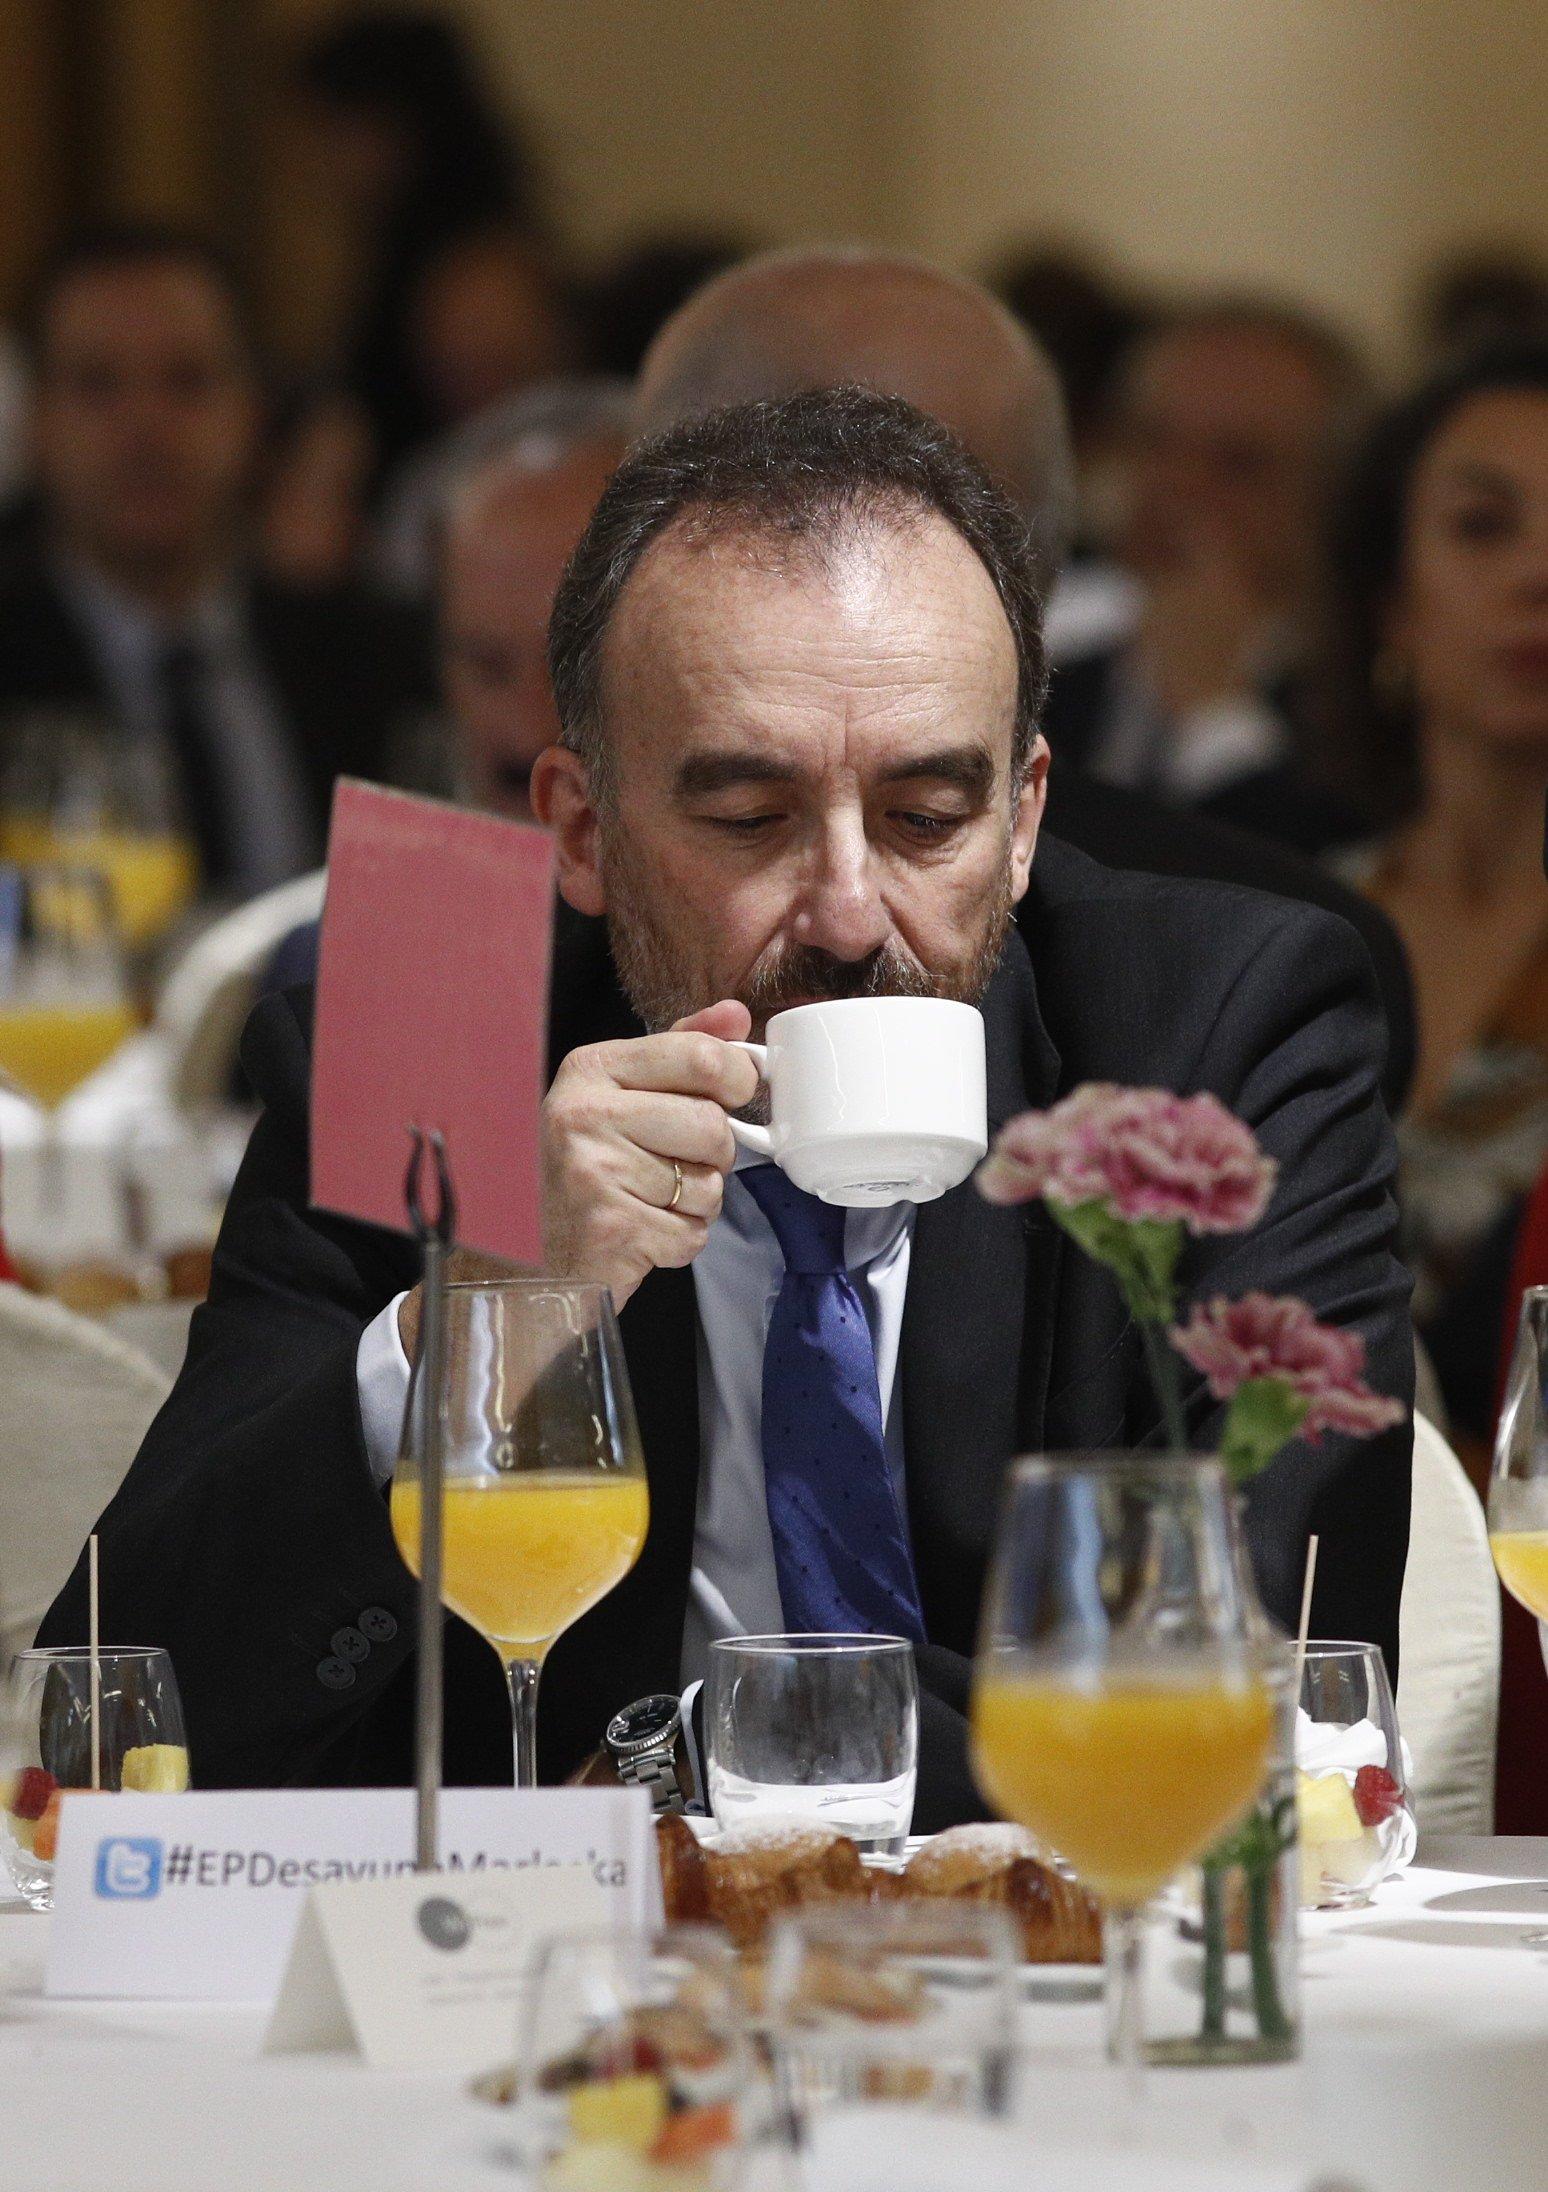 manuel marchena xarrupa EP